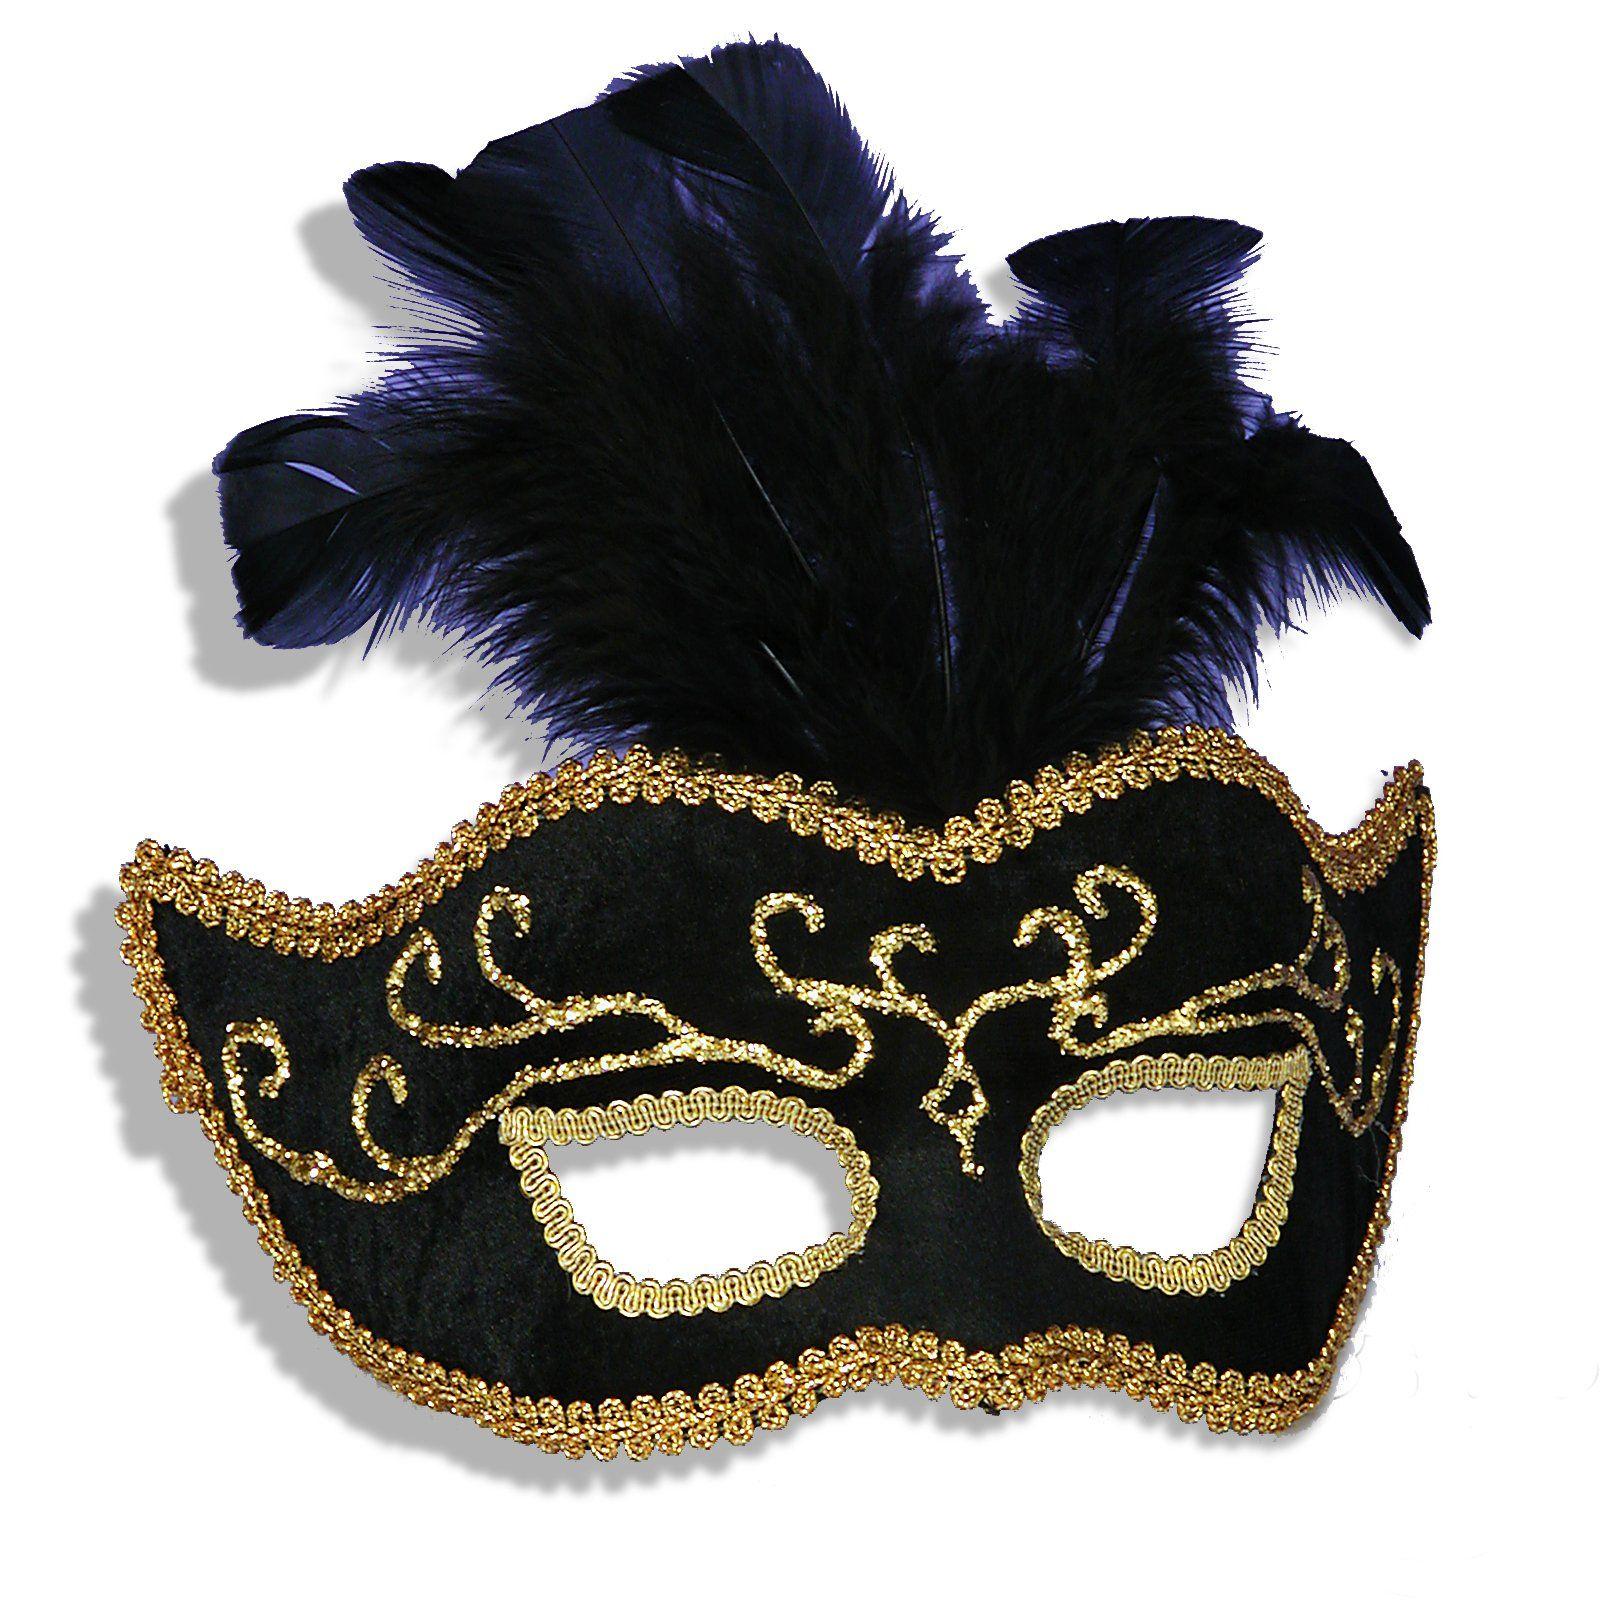 masquerade | Masquerades Masks Made With Plastic | Masquerade ...